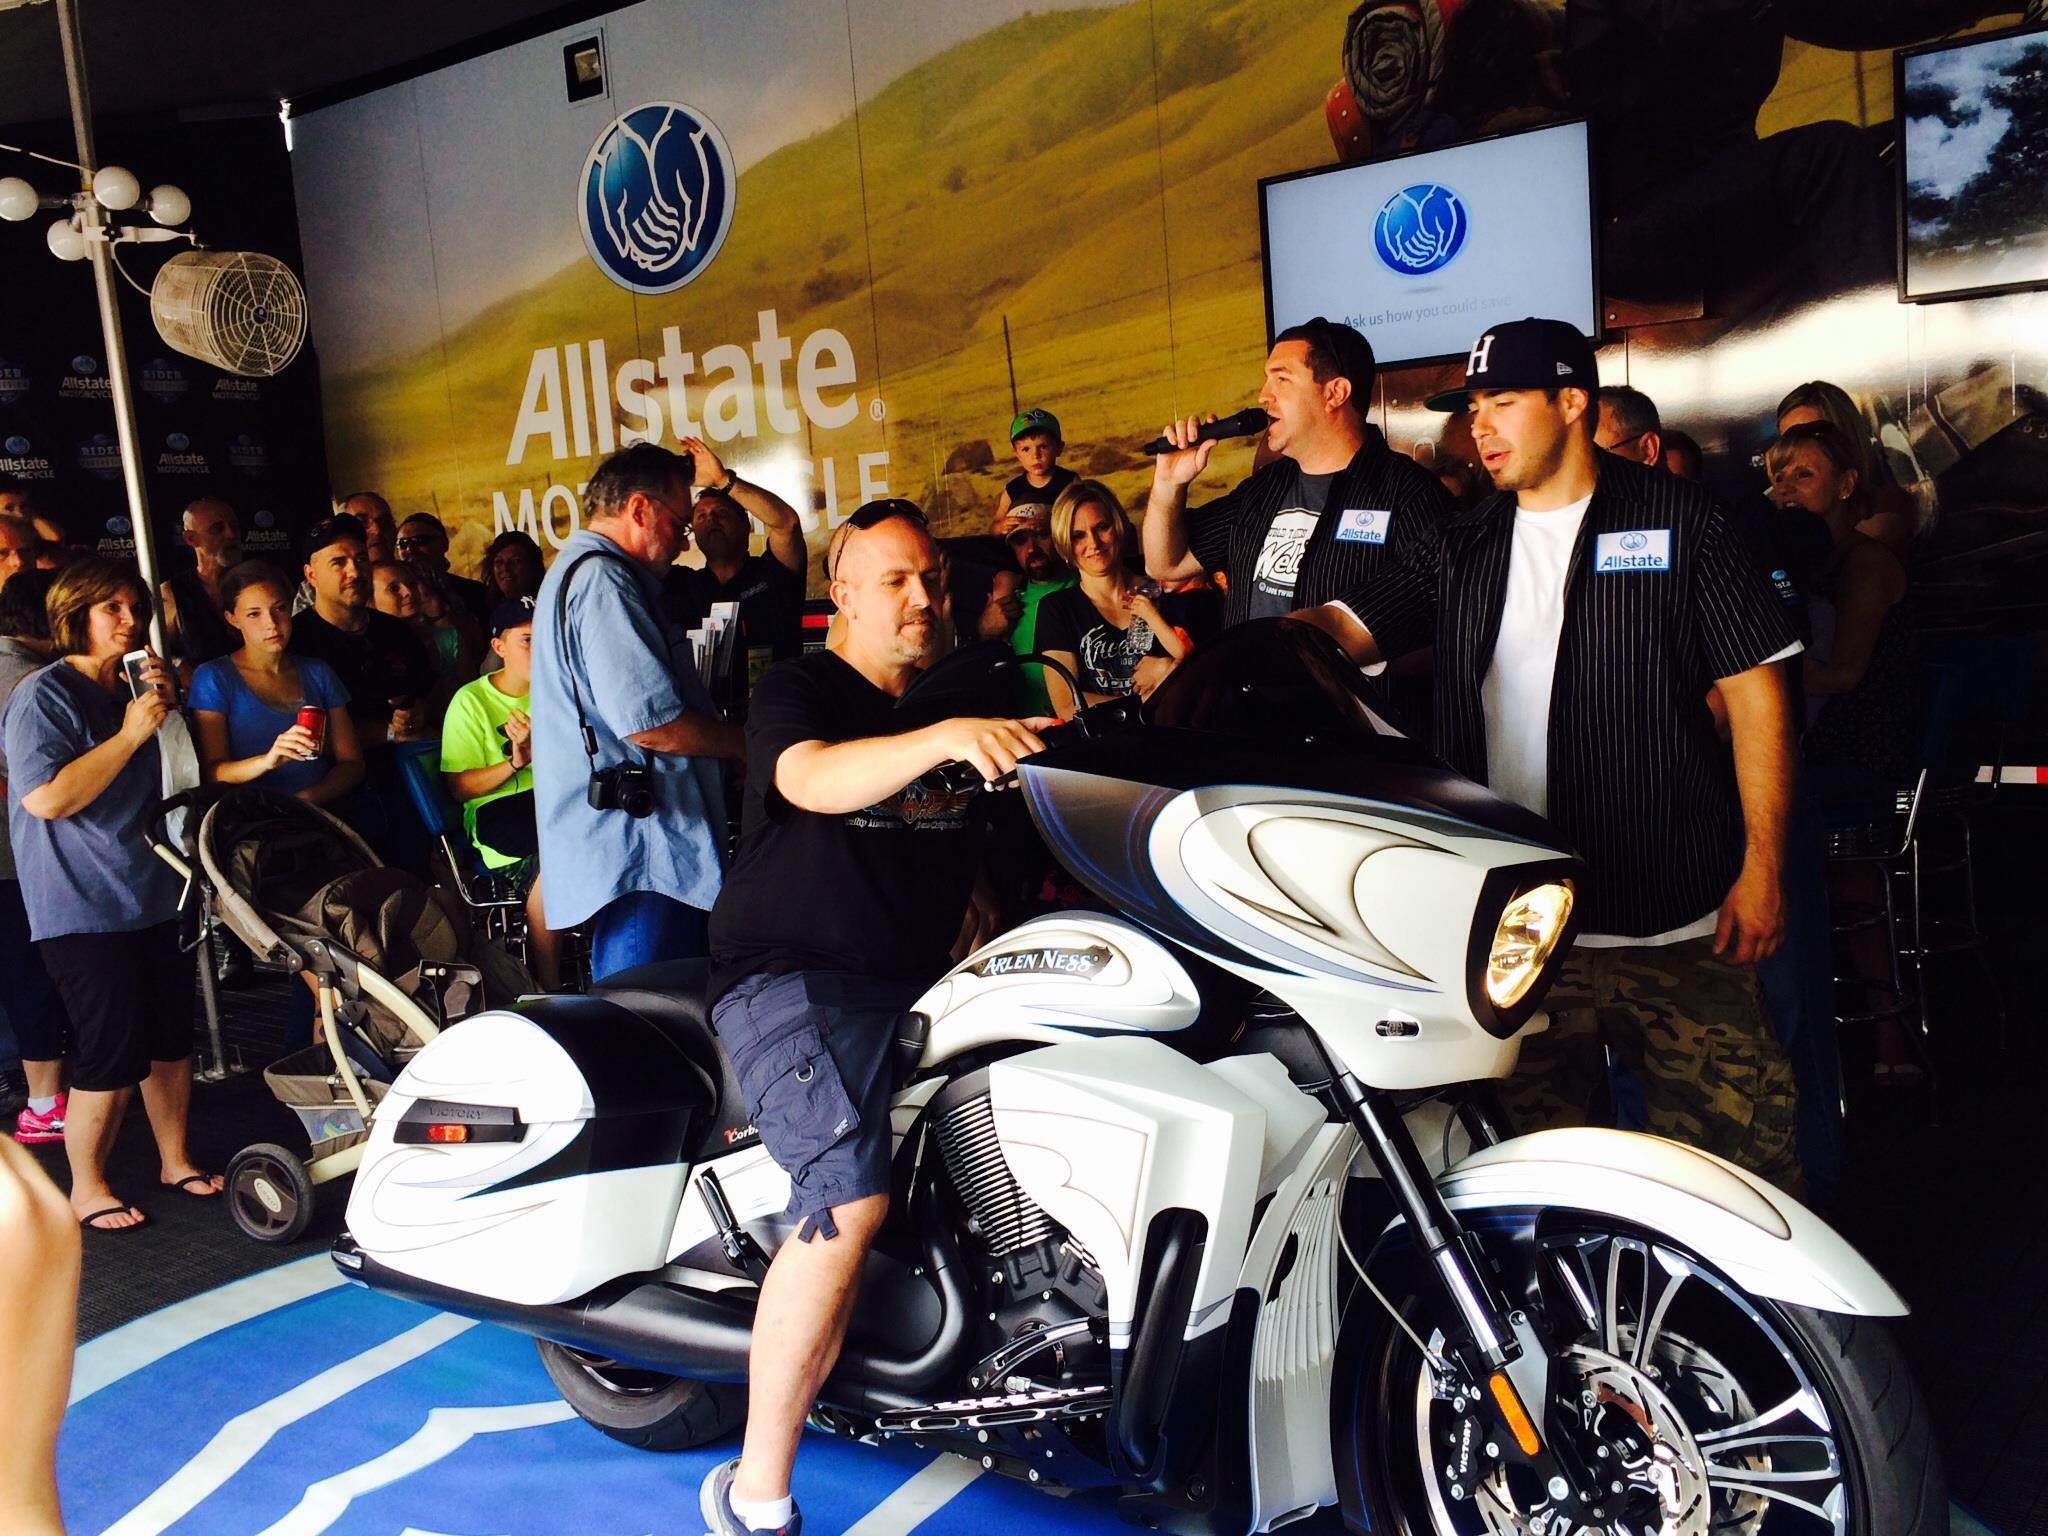 Gary Bendik: Allstate Insurance image 8